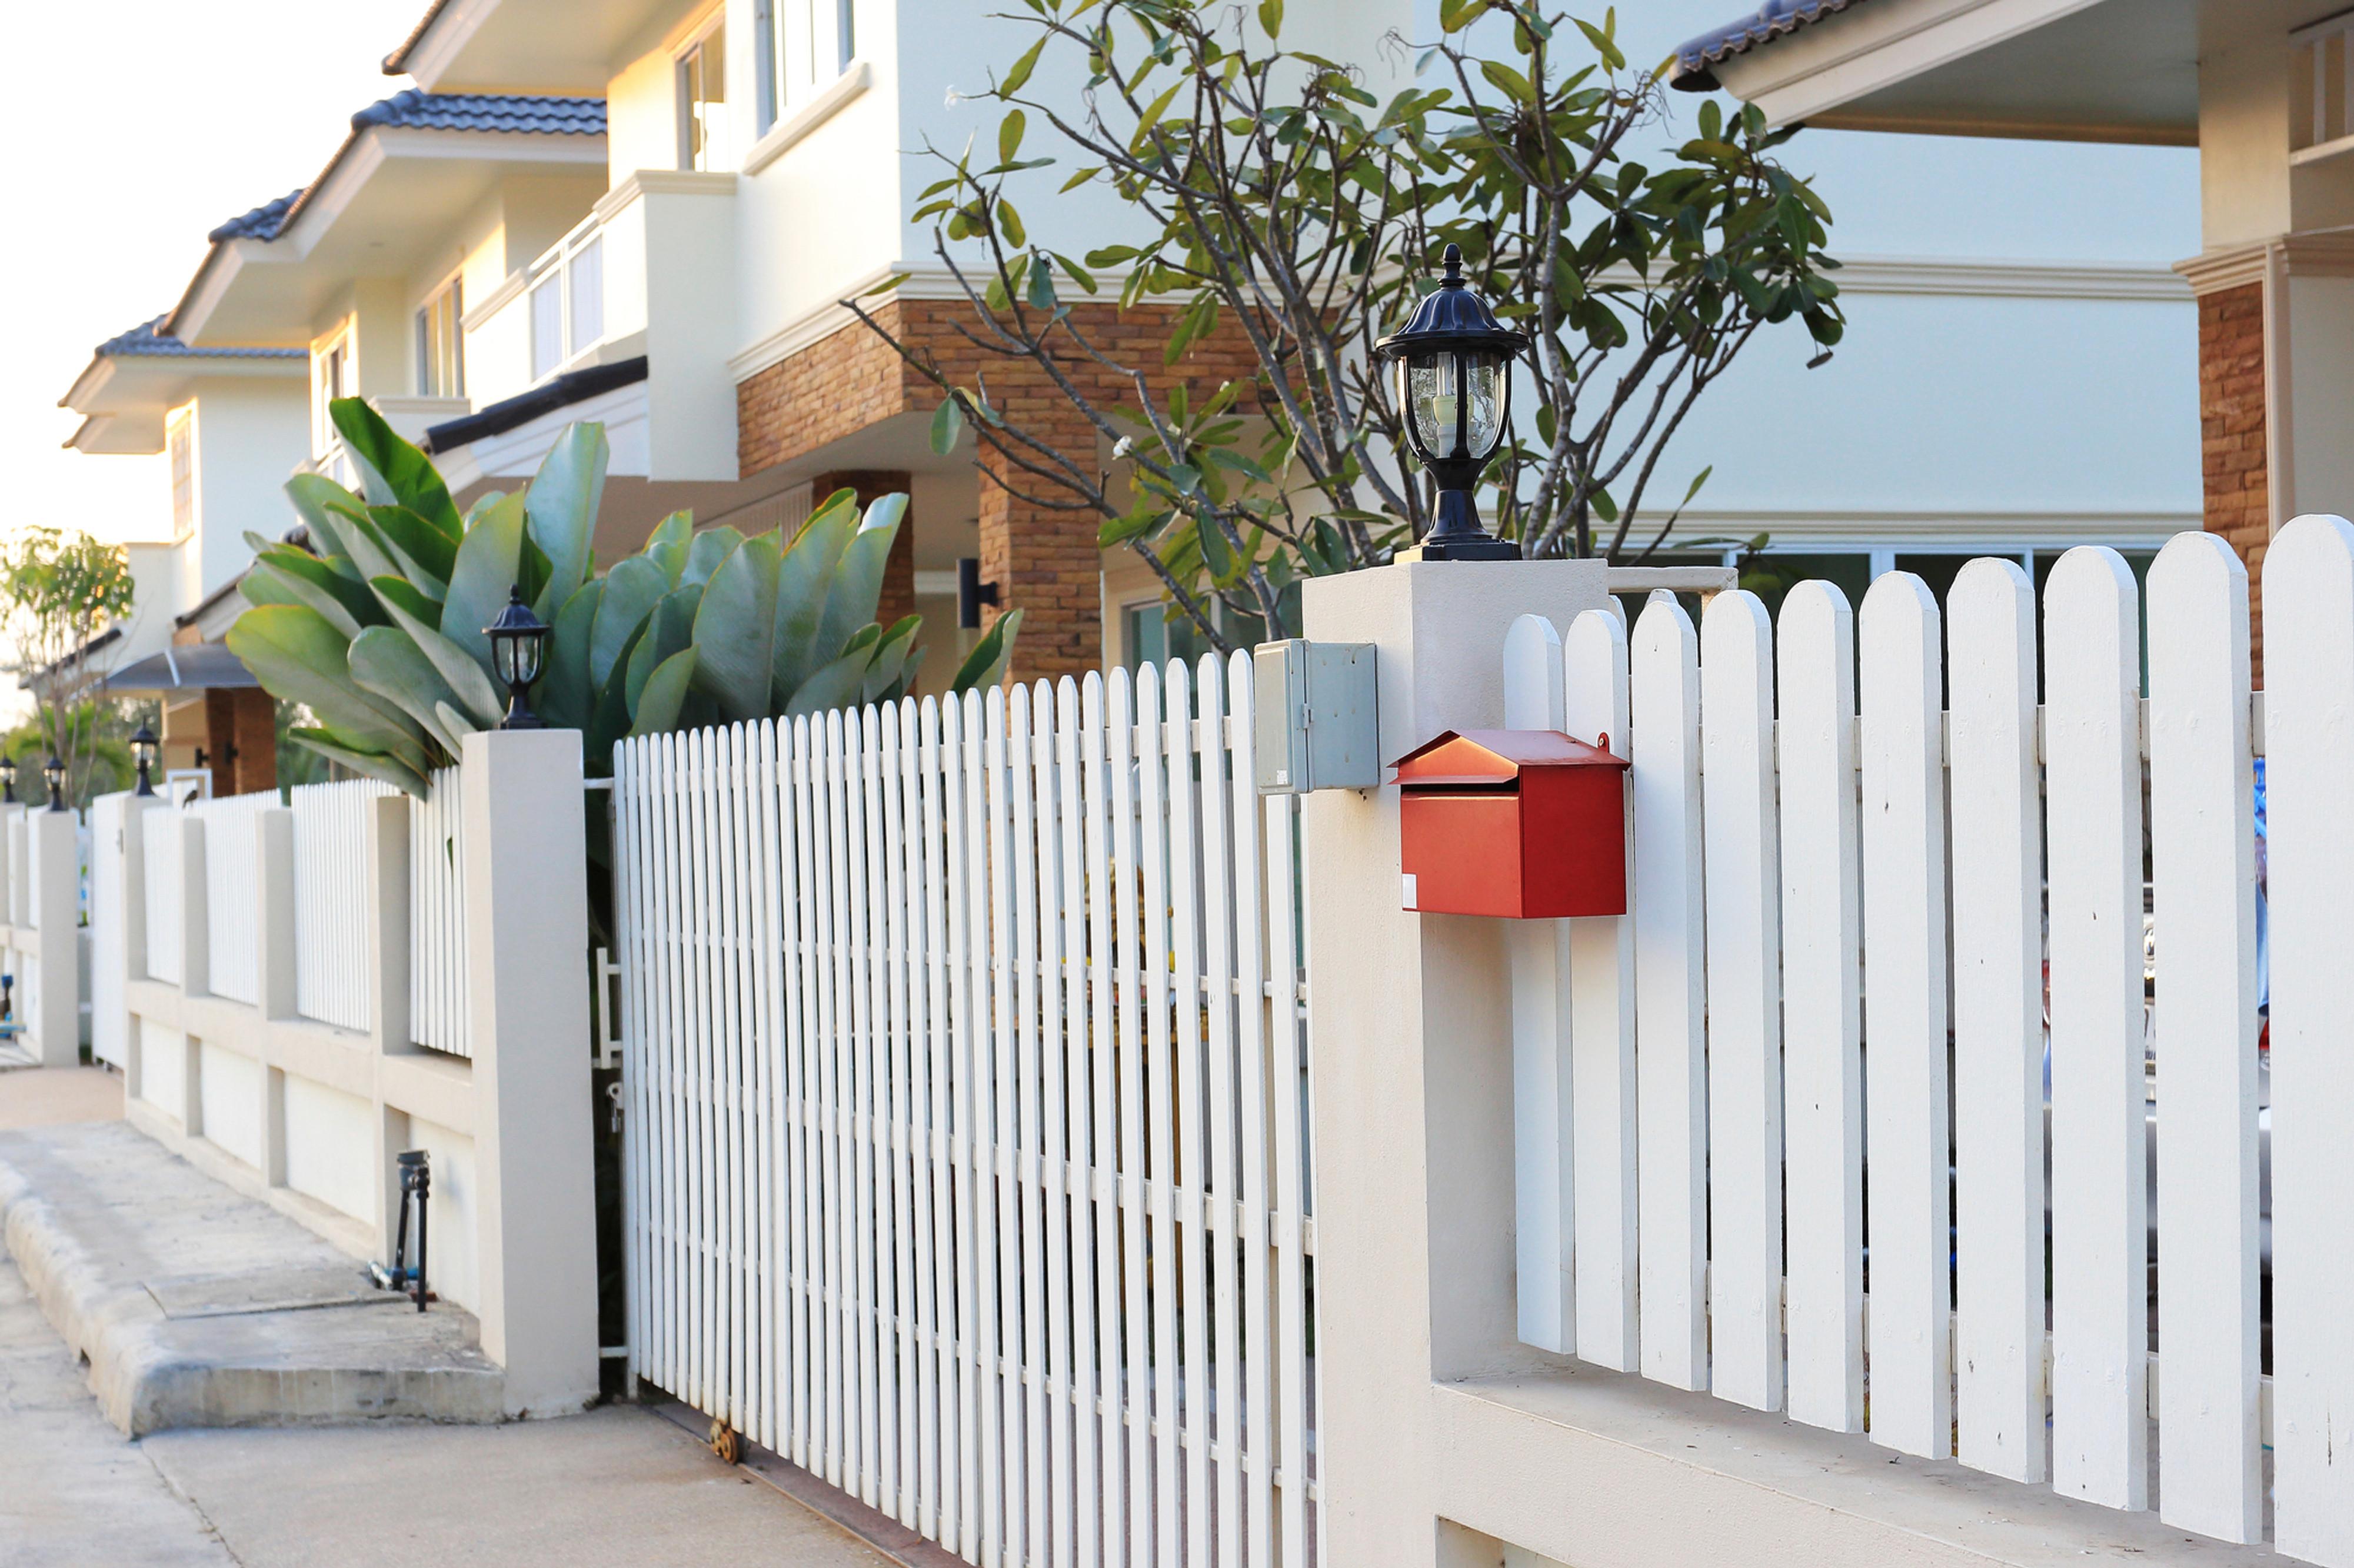 Fence Installation Estimate